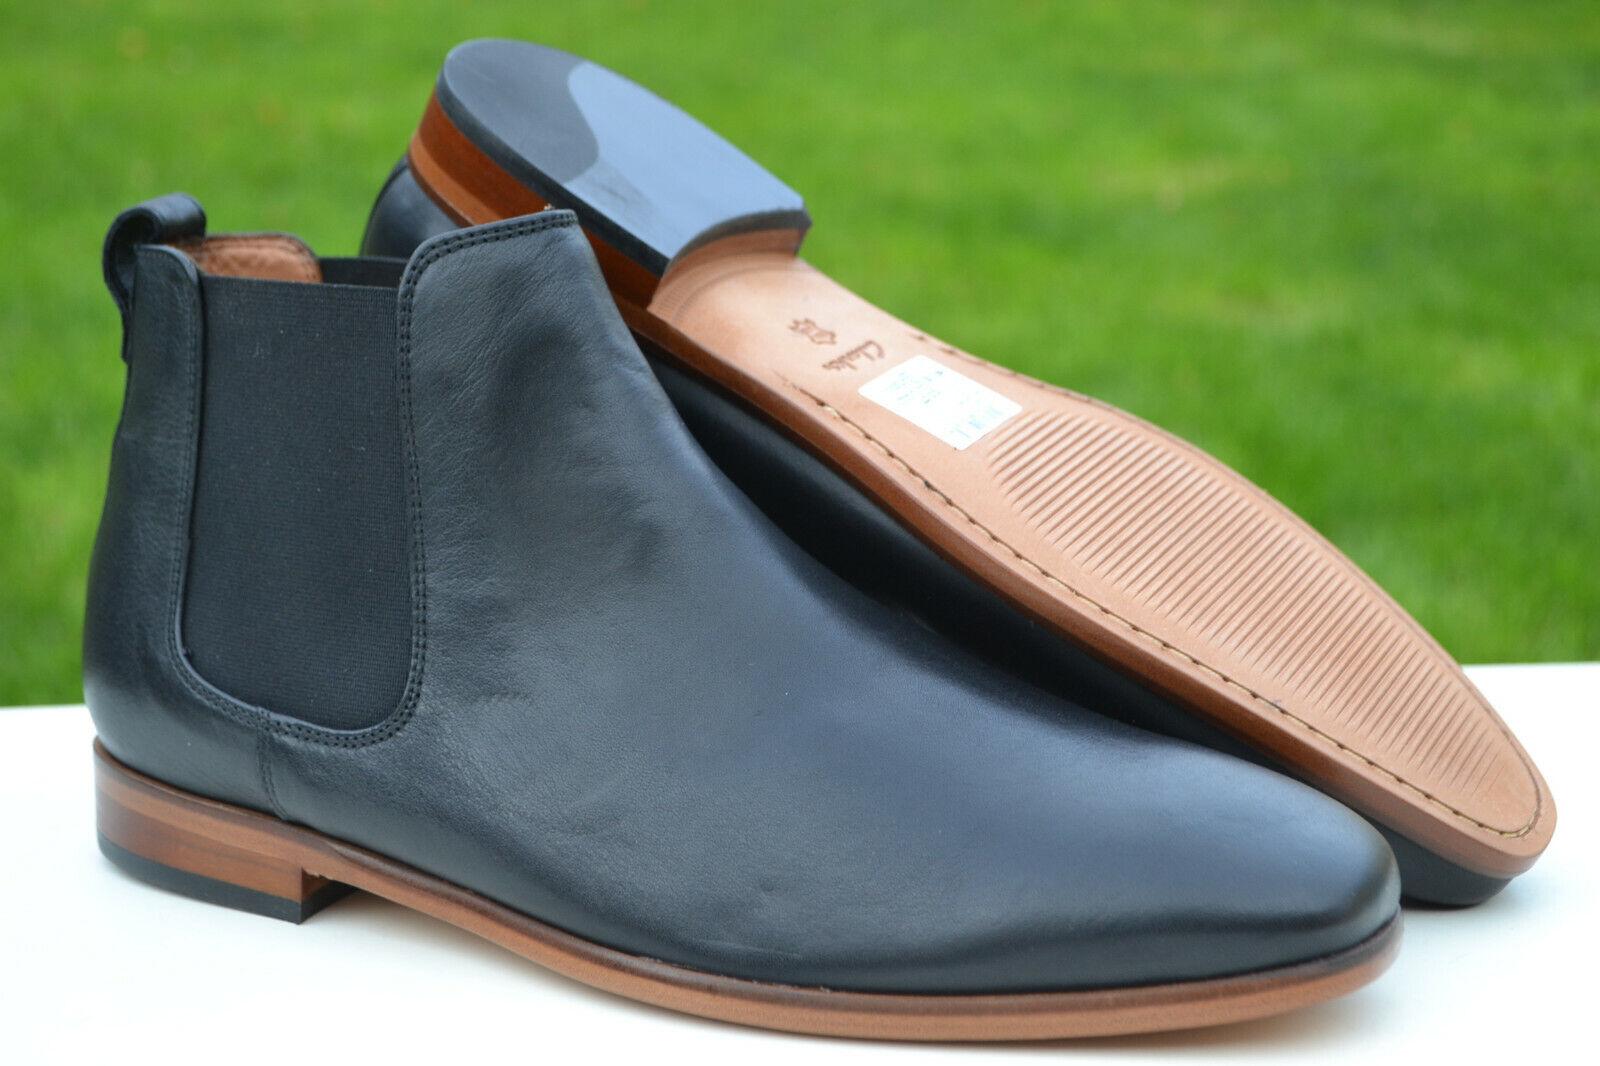 Clarks BNIB Mens Welted Chelsea Boots CODE HI Black Leather UK 10 / 44.5